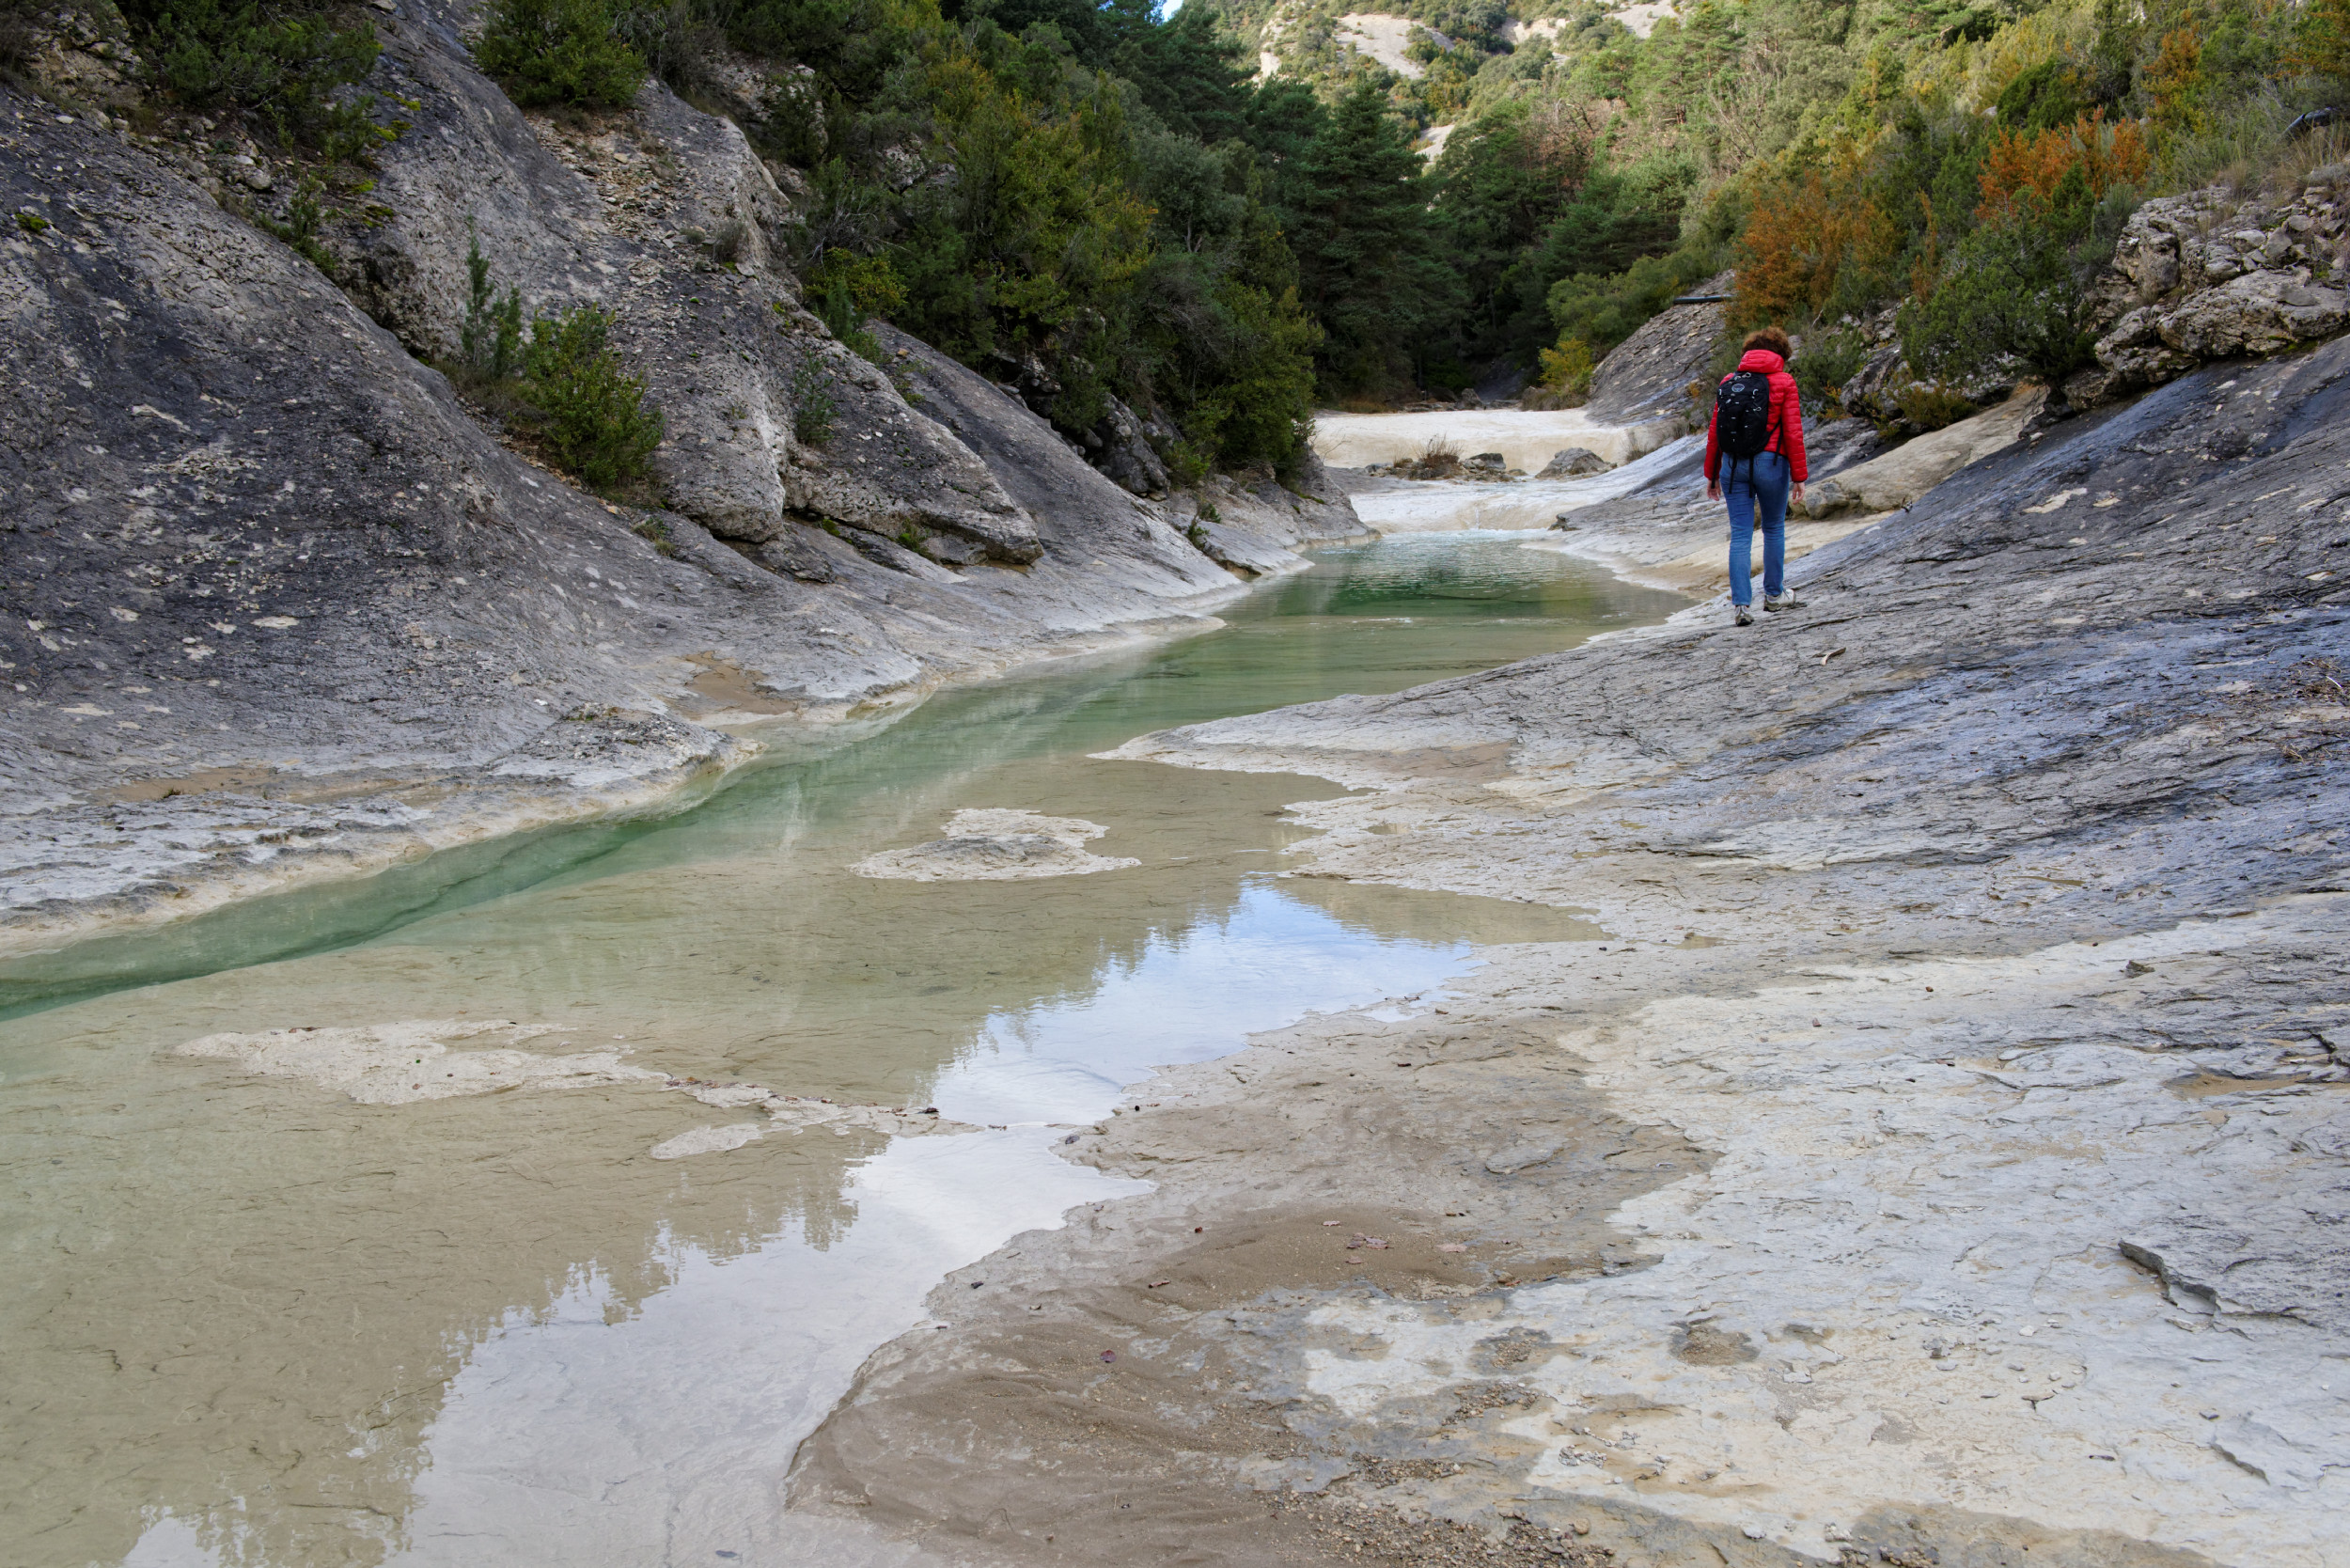 141208-Sieste - Canyon et Barranco (Sobrarbe) (27)